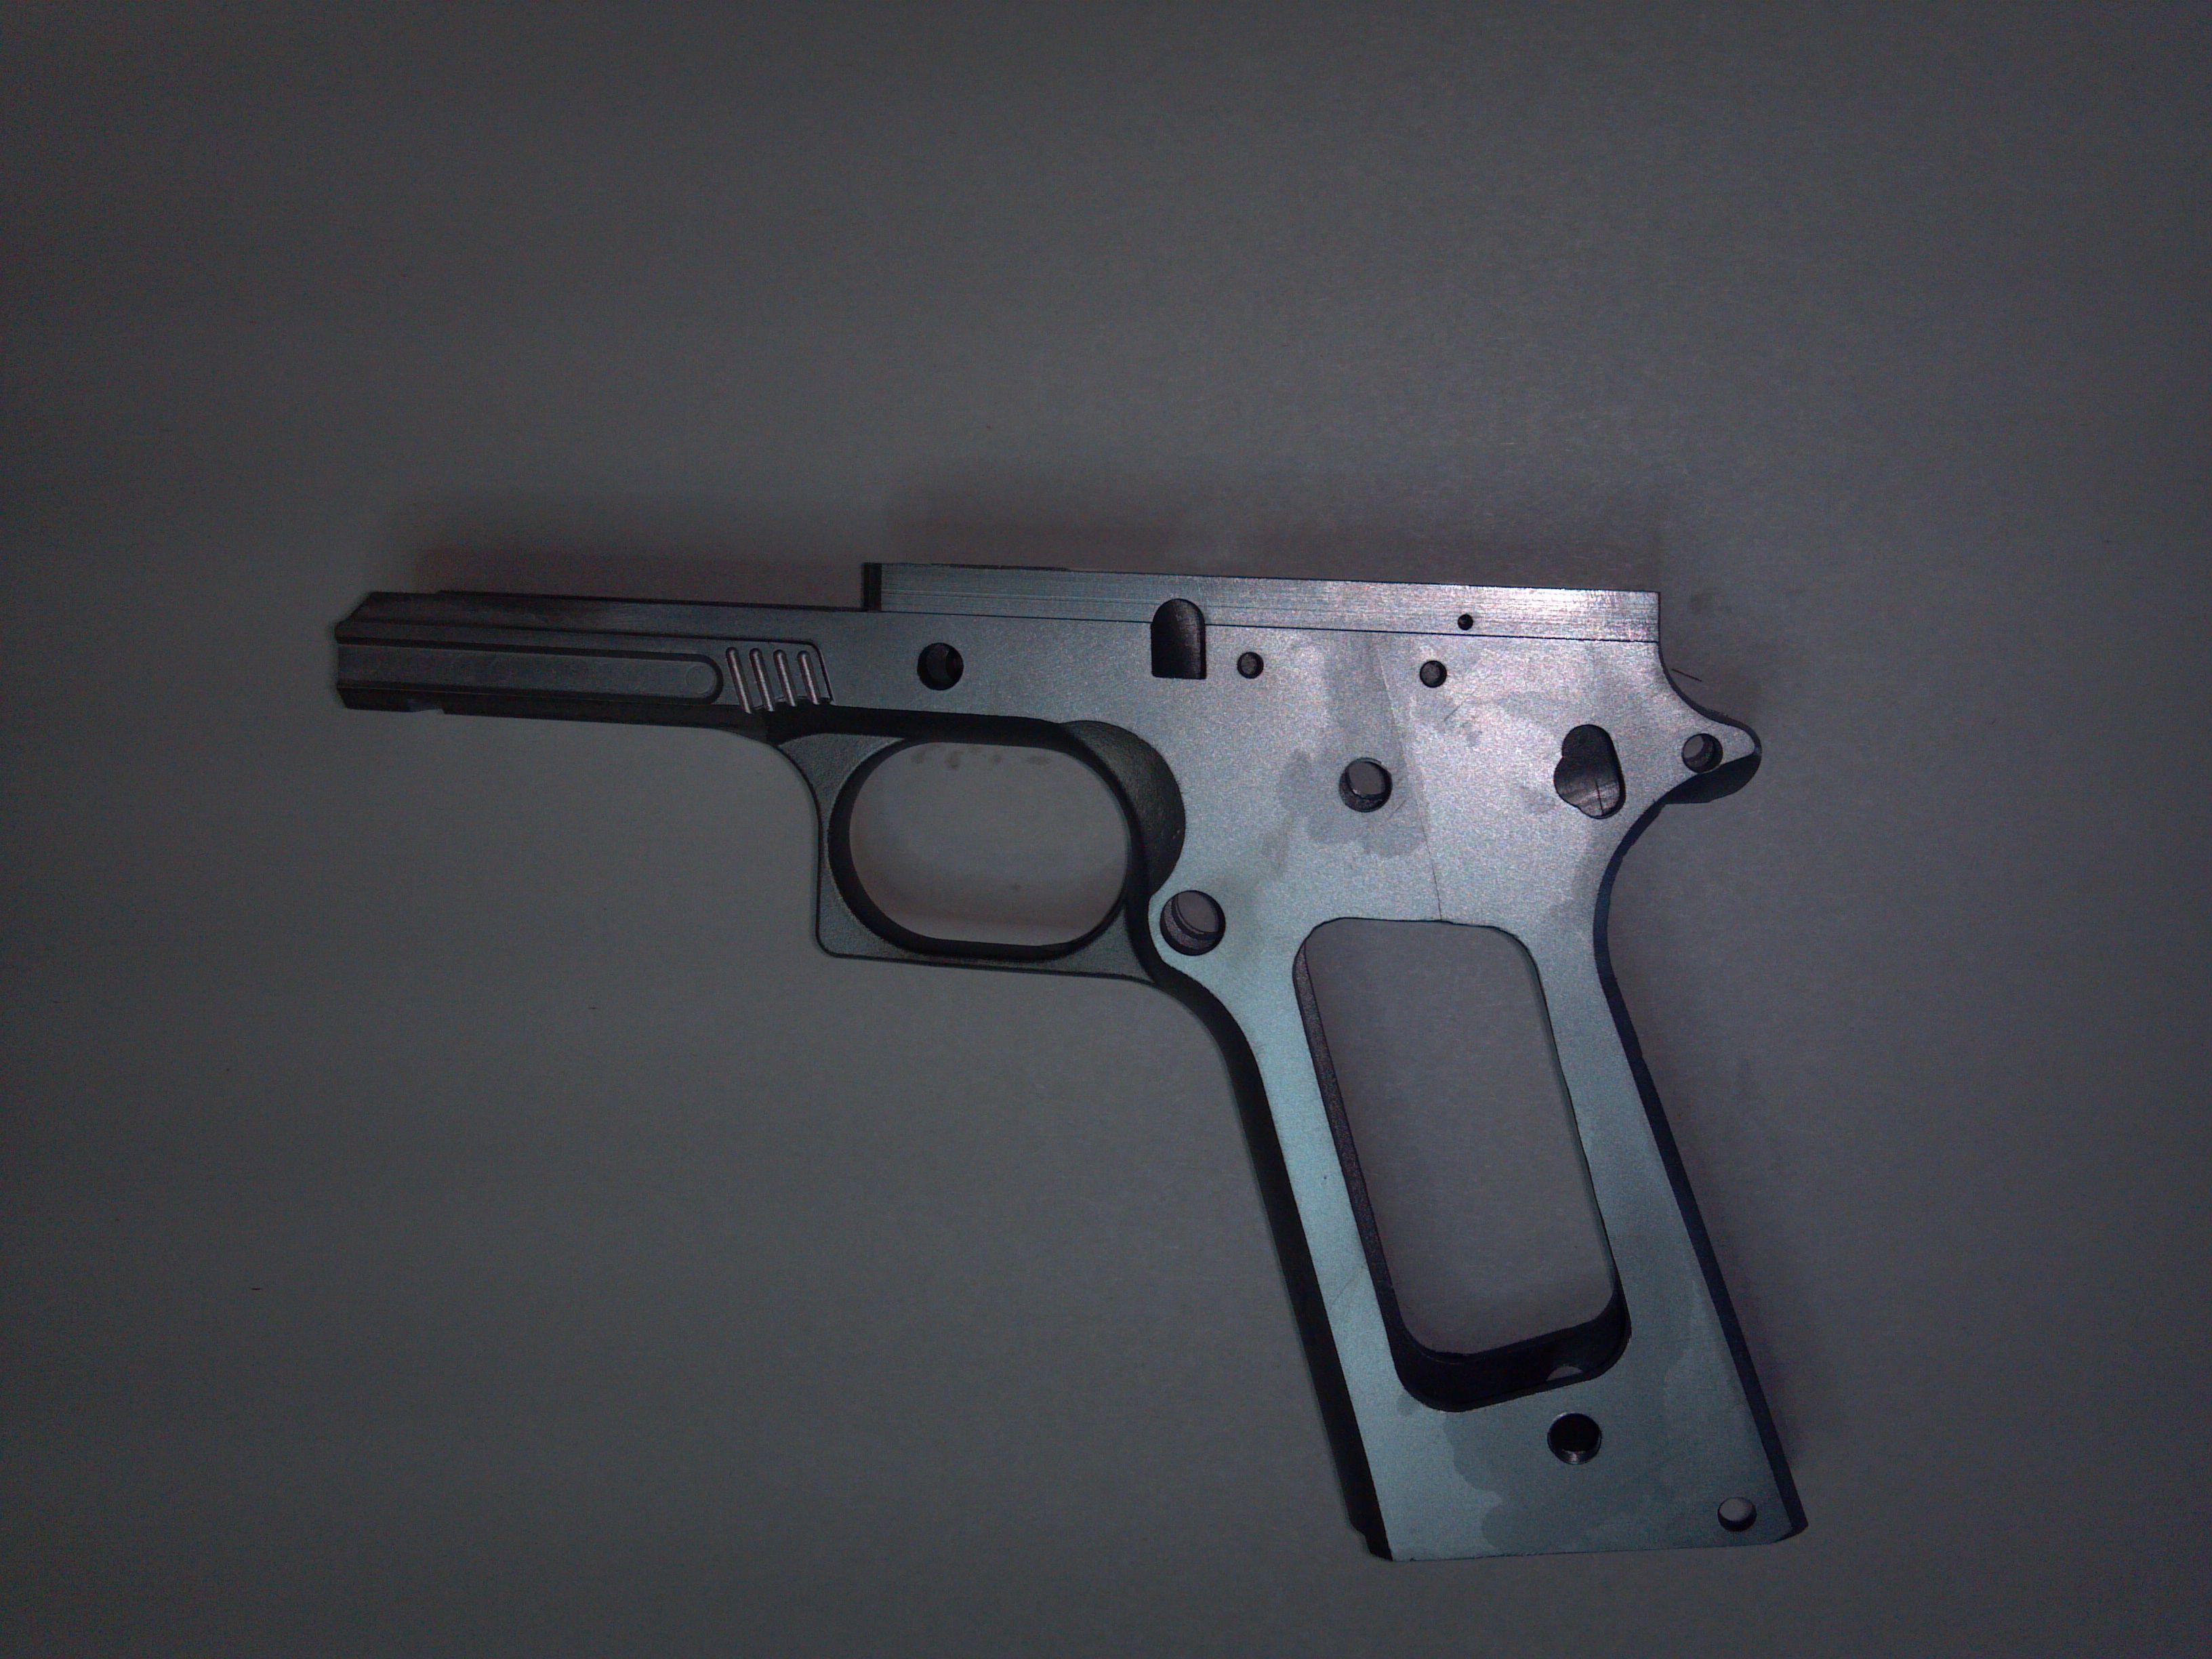 80 Percent 1911 Frame | 1911 | Pinterest | Percents, Guns and Weapons